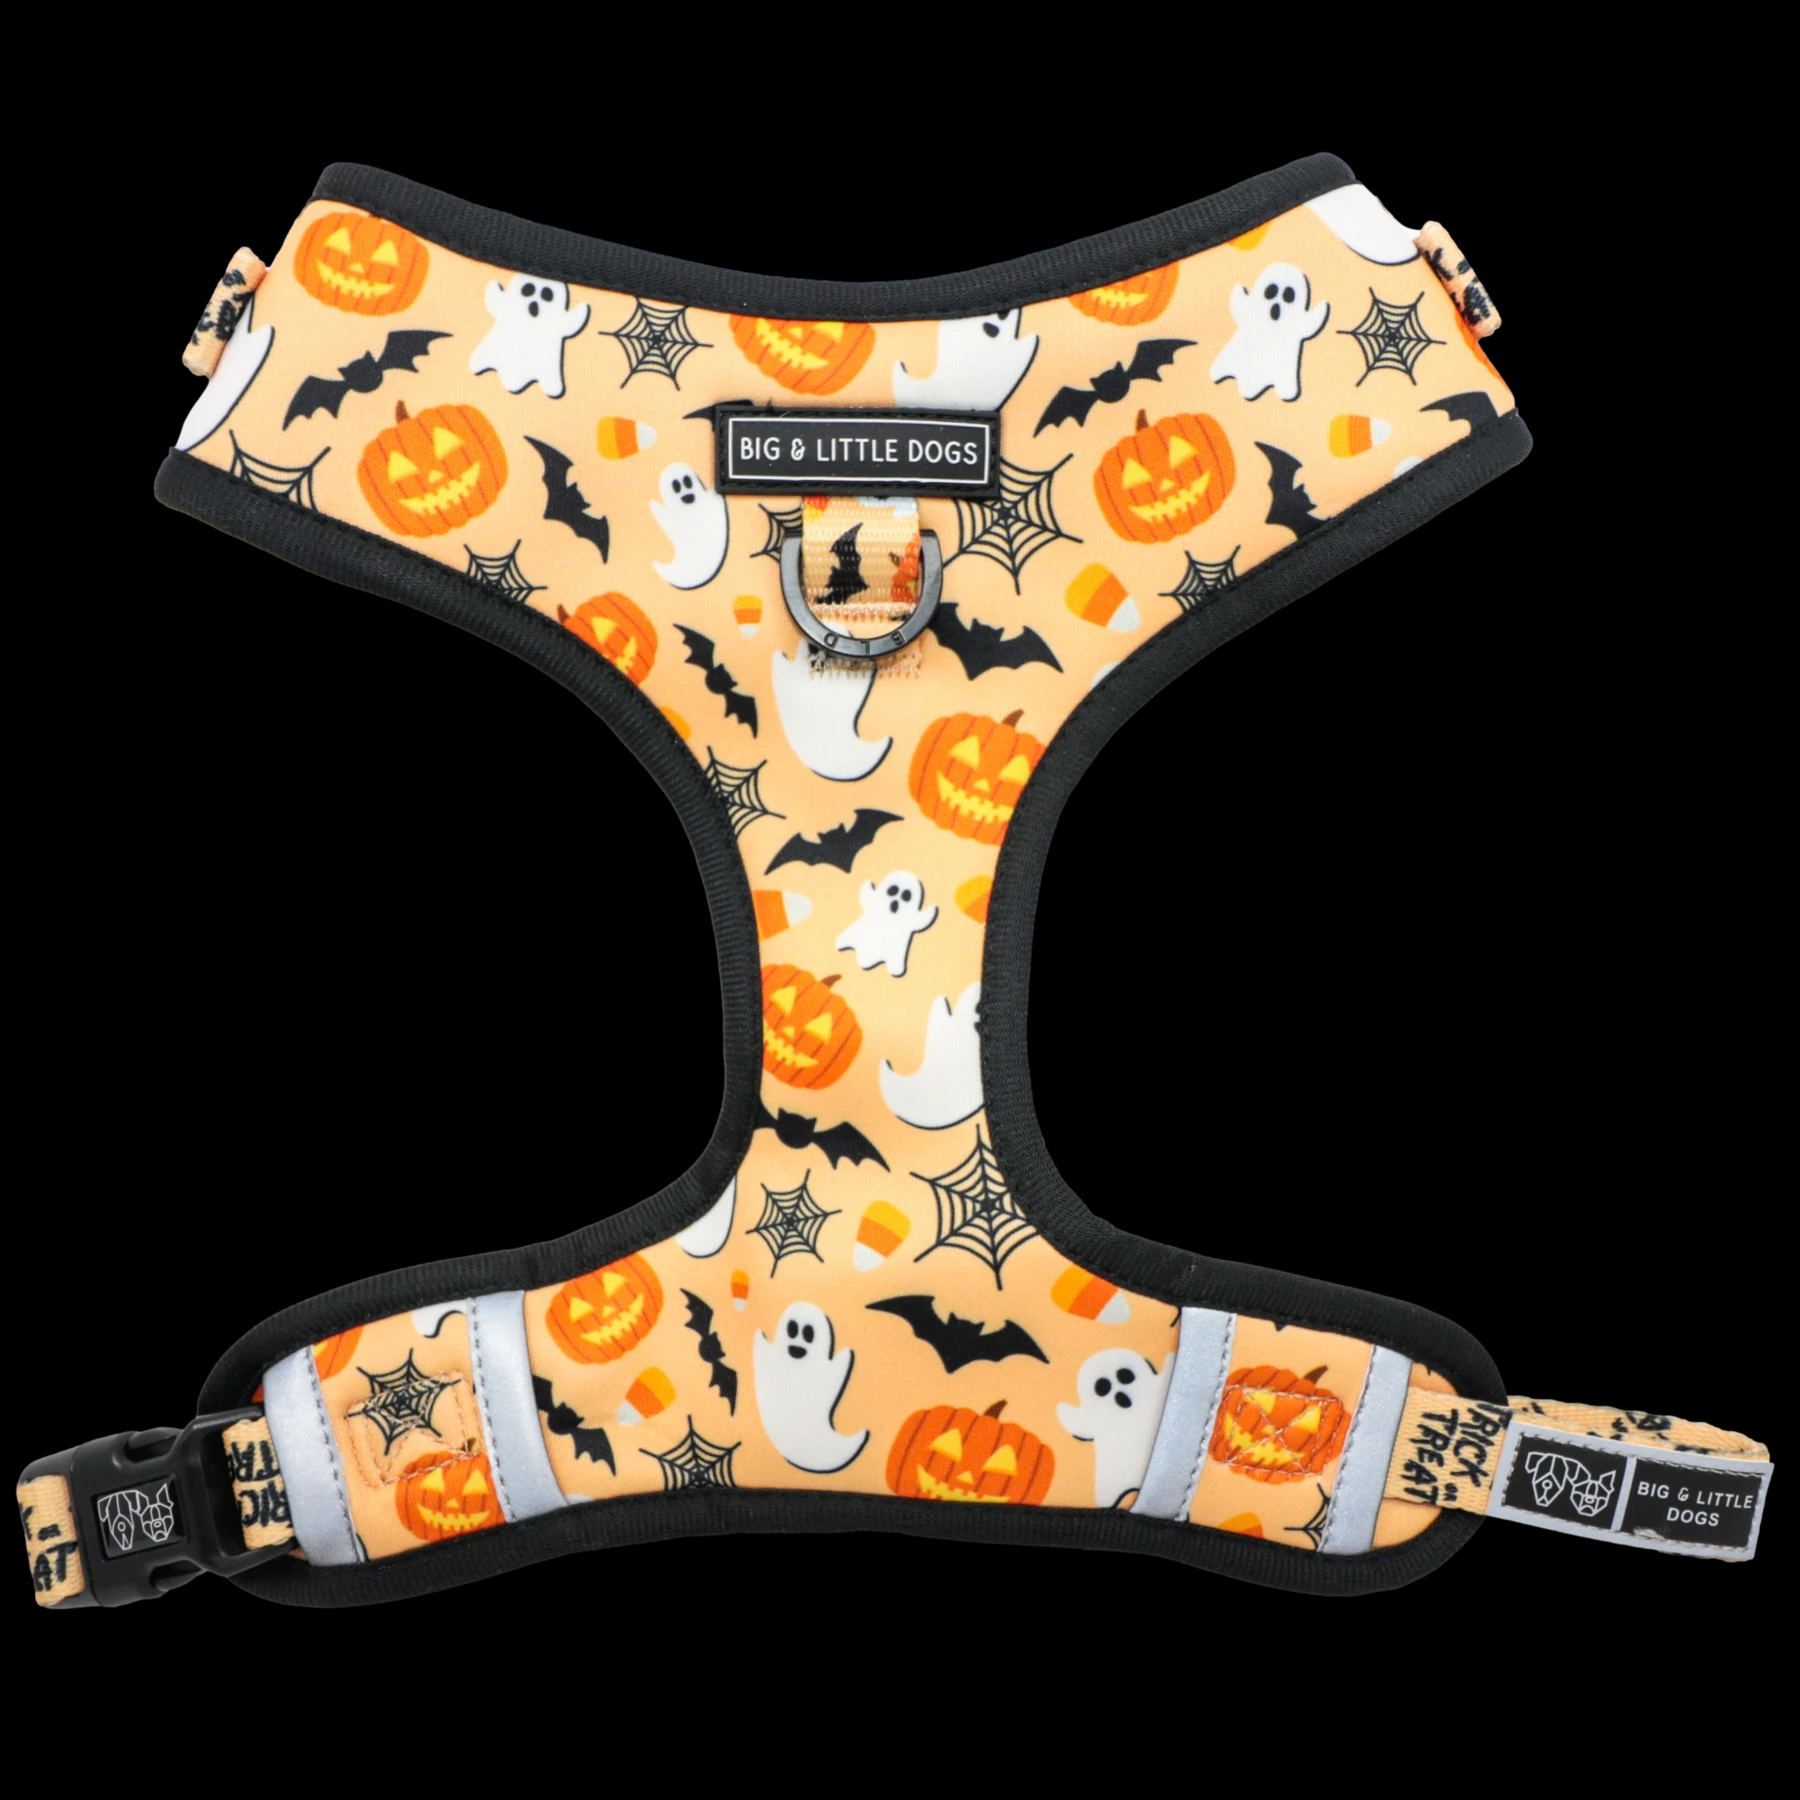 Spooky season adjustable harness